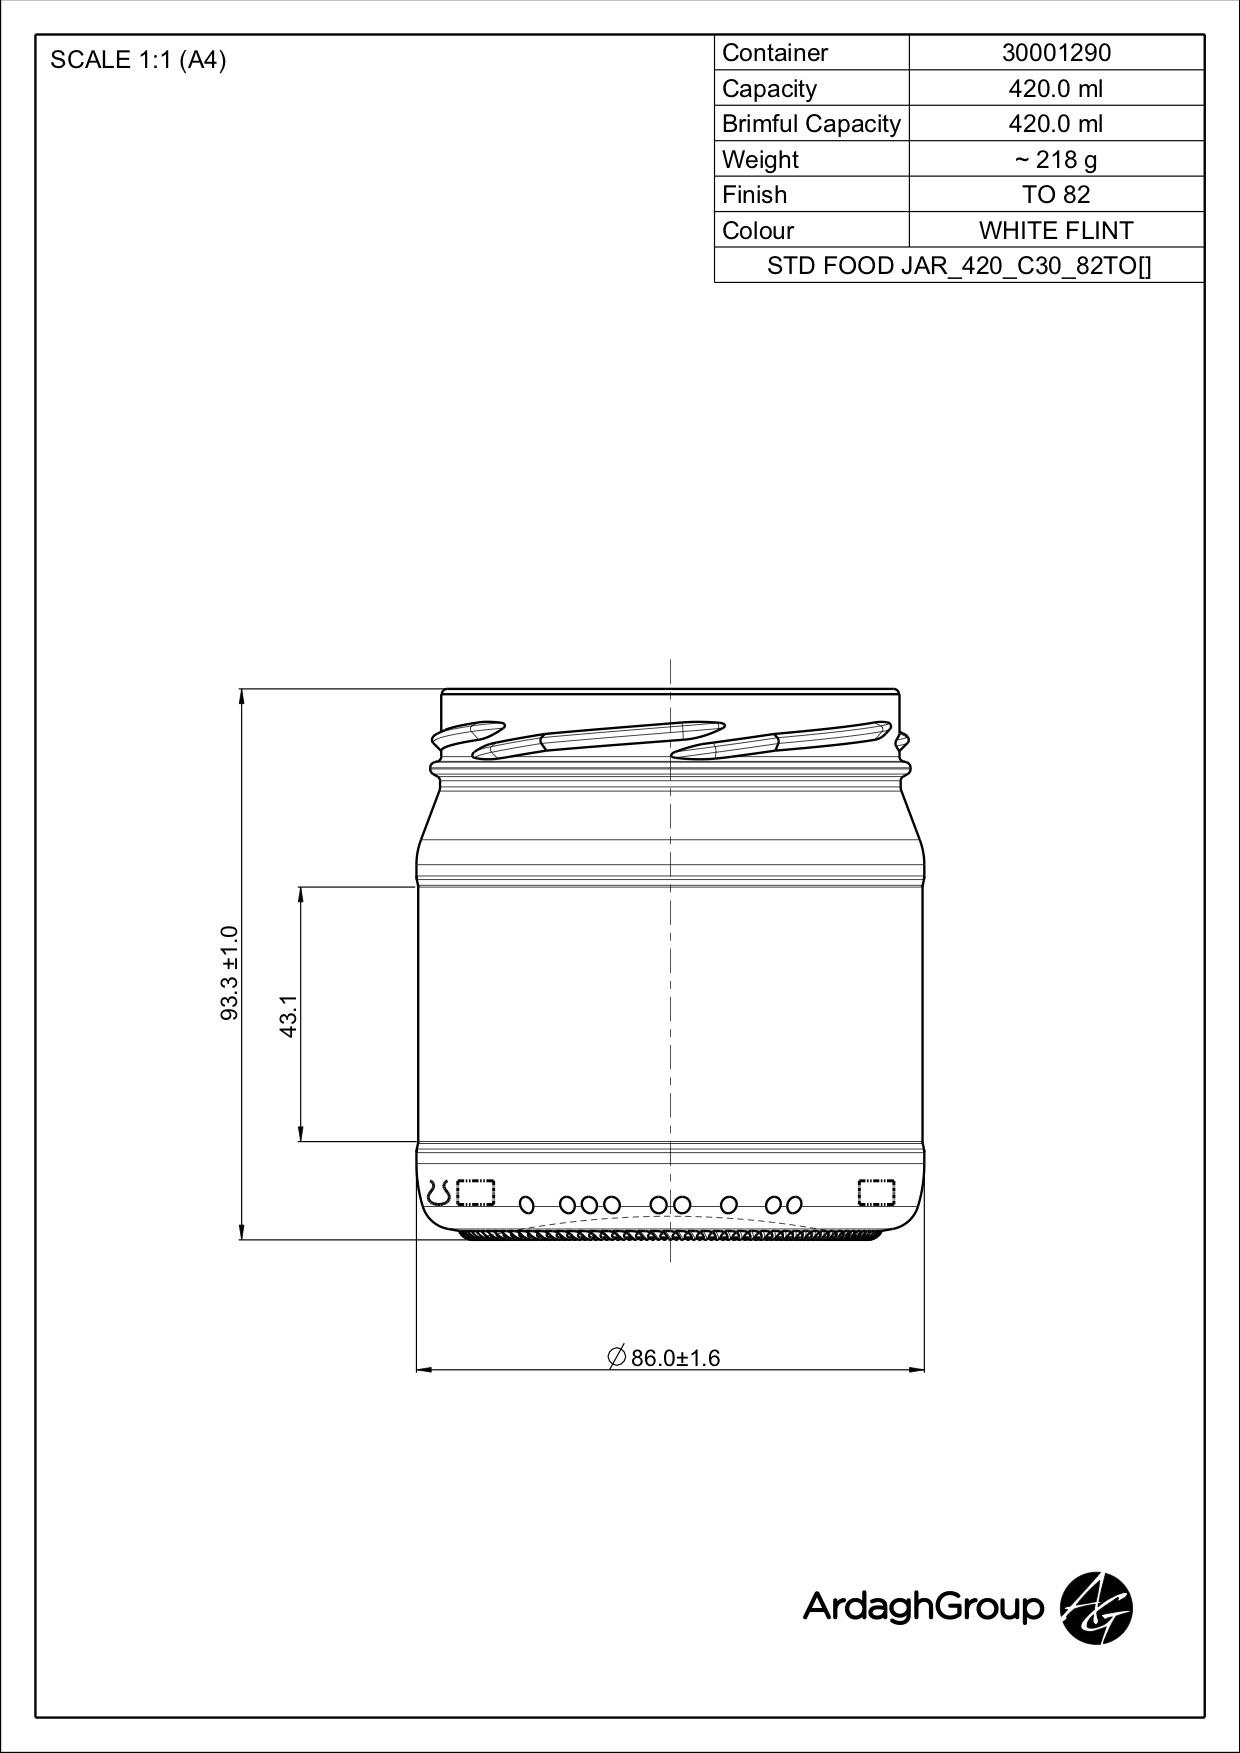 STD FOOD JAR_420_C30_82TO